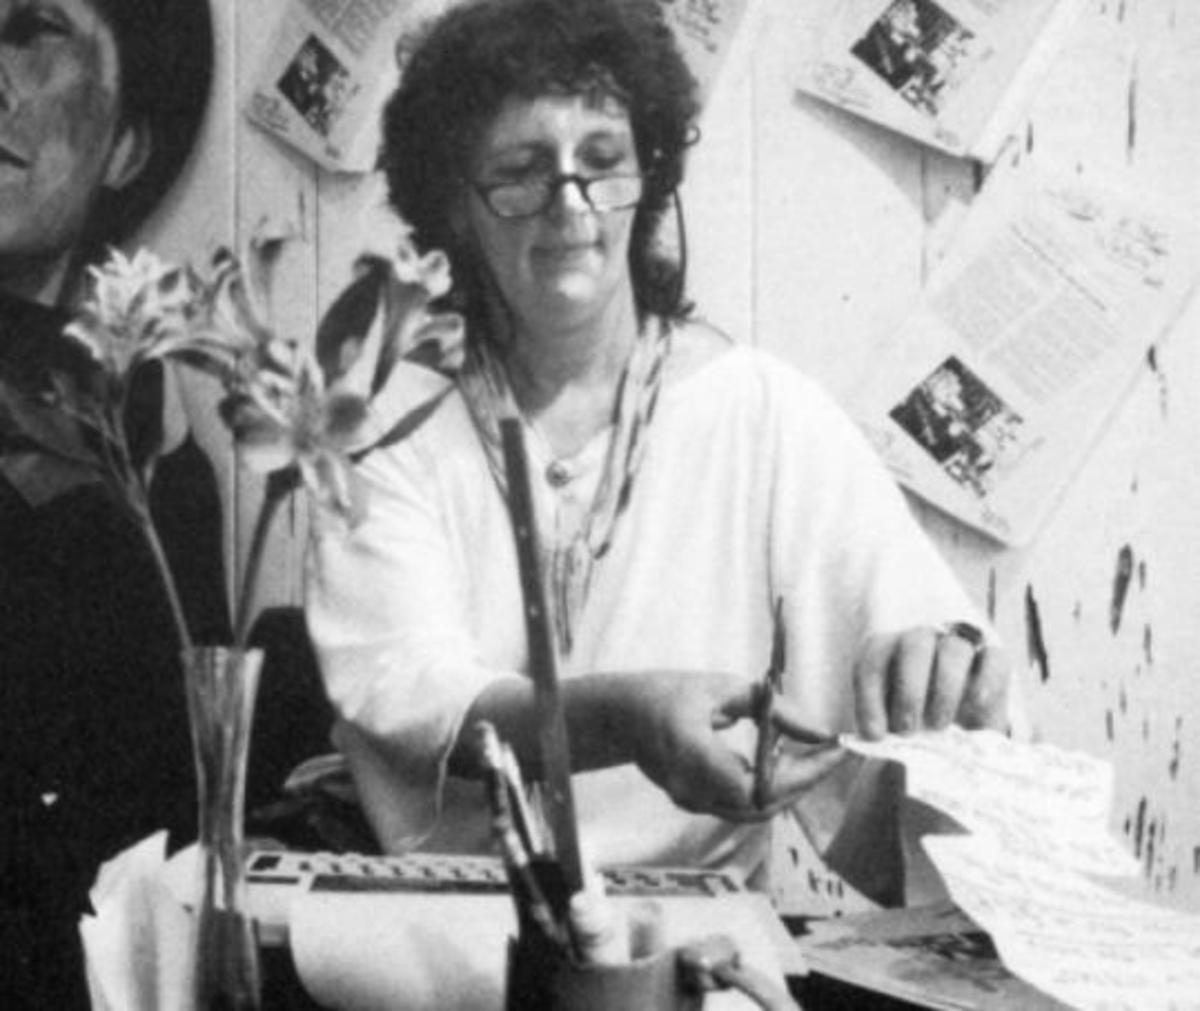 Georgelle Cynthia Hirliman (b. June 11, 1936 - d. January 29, 2010) - cancer deaths